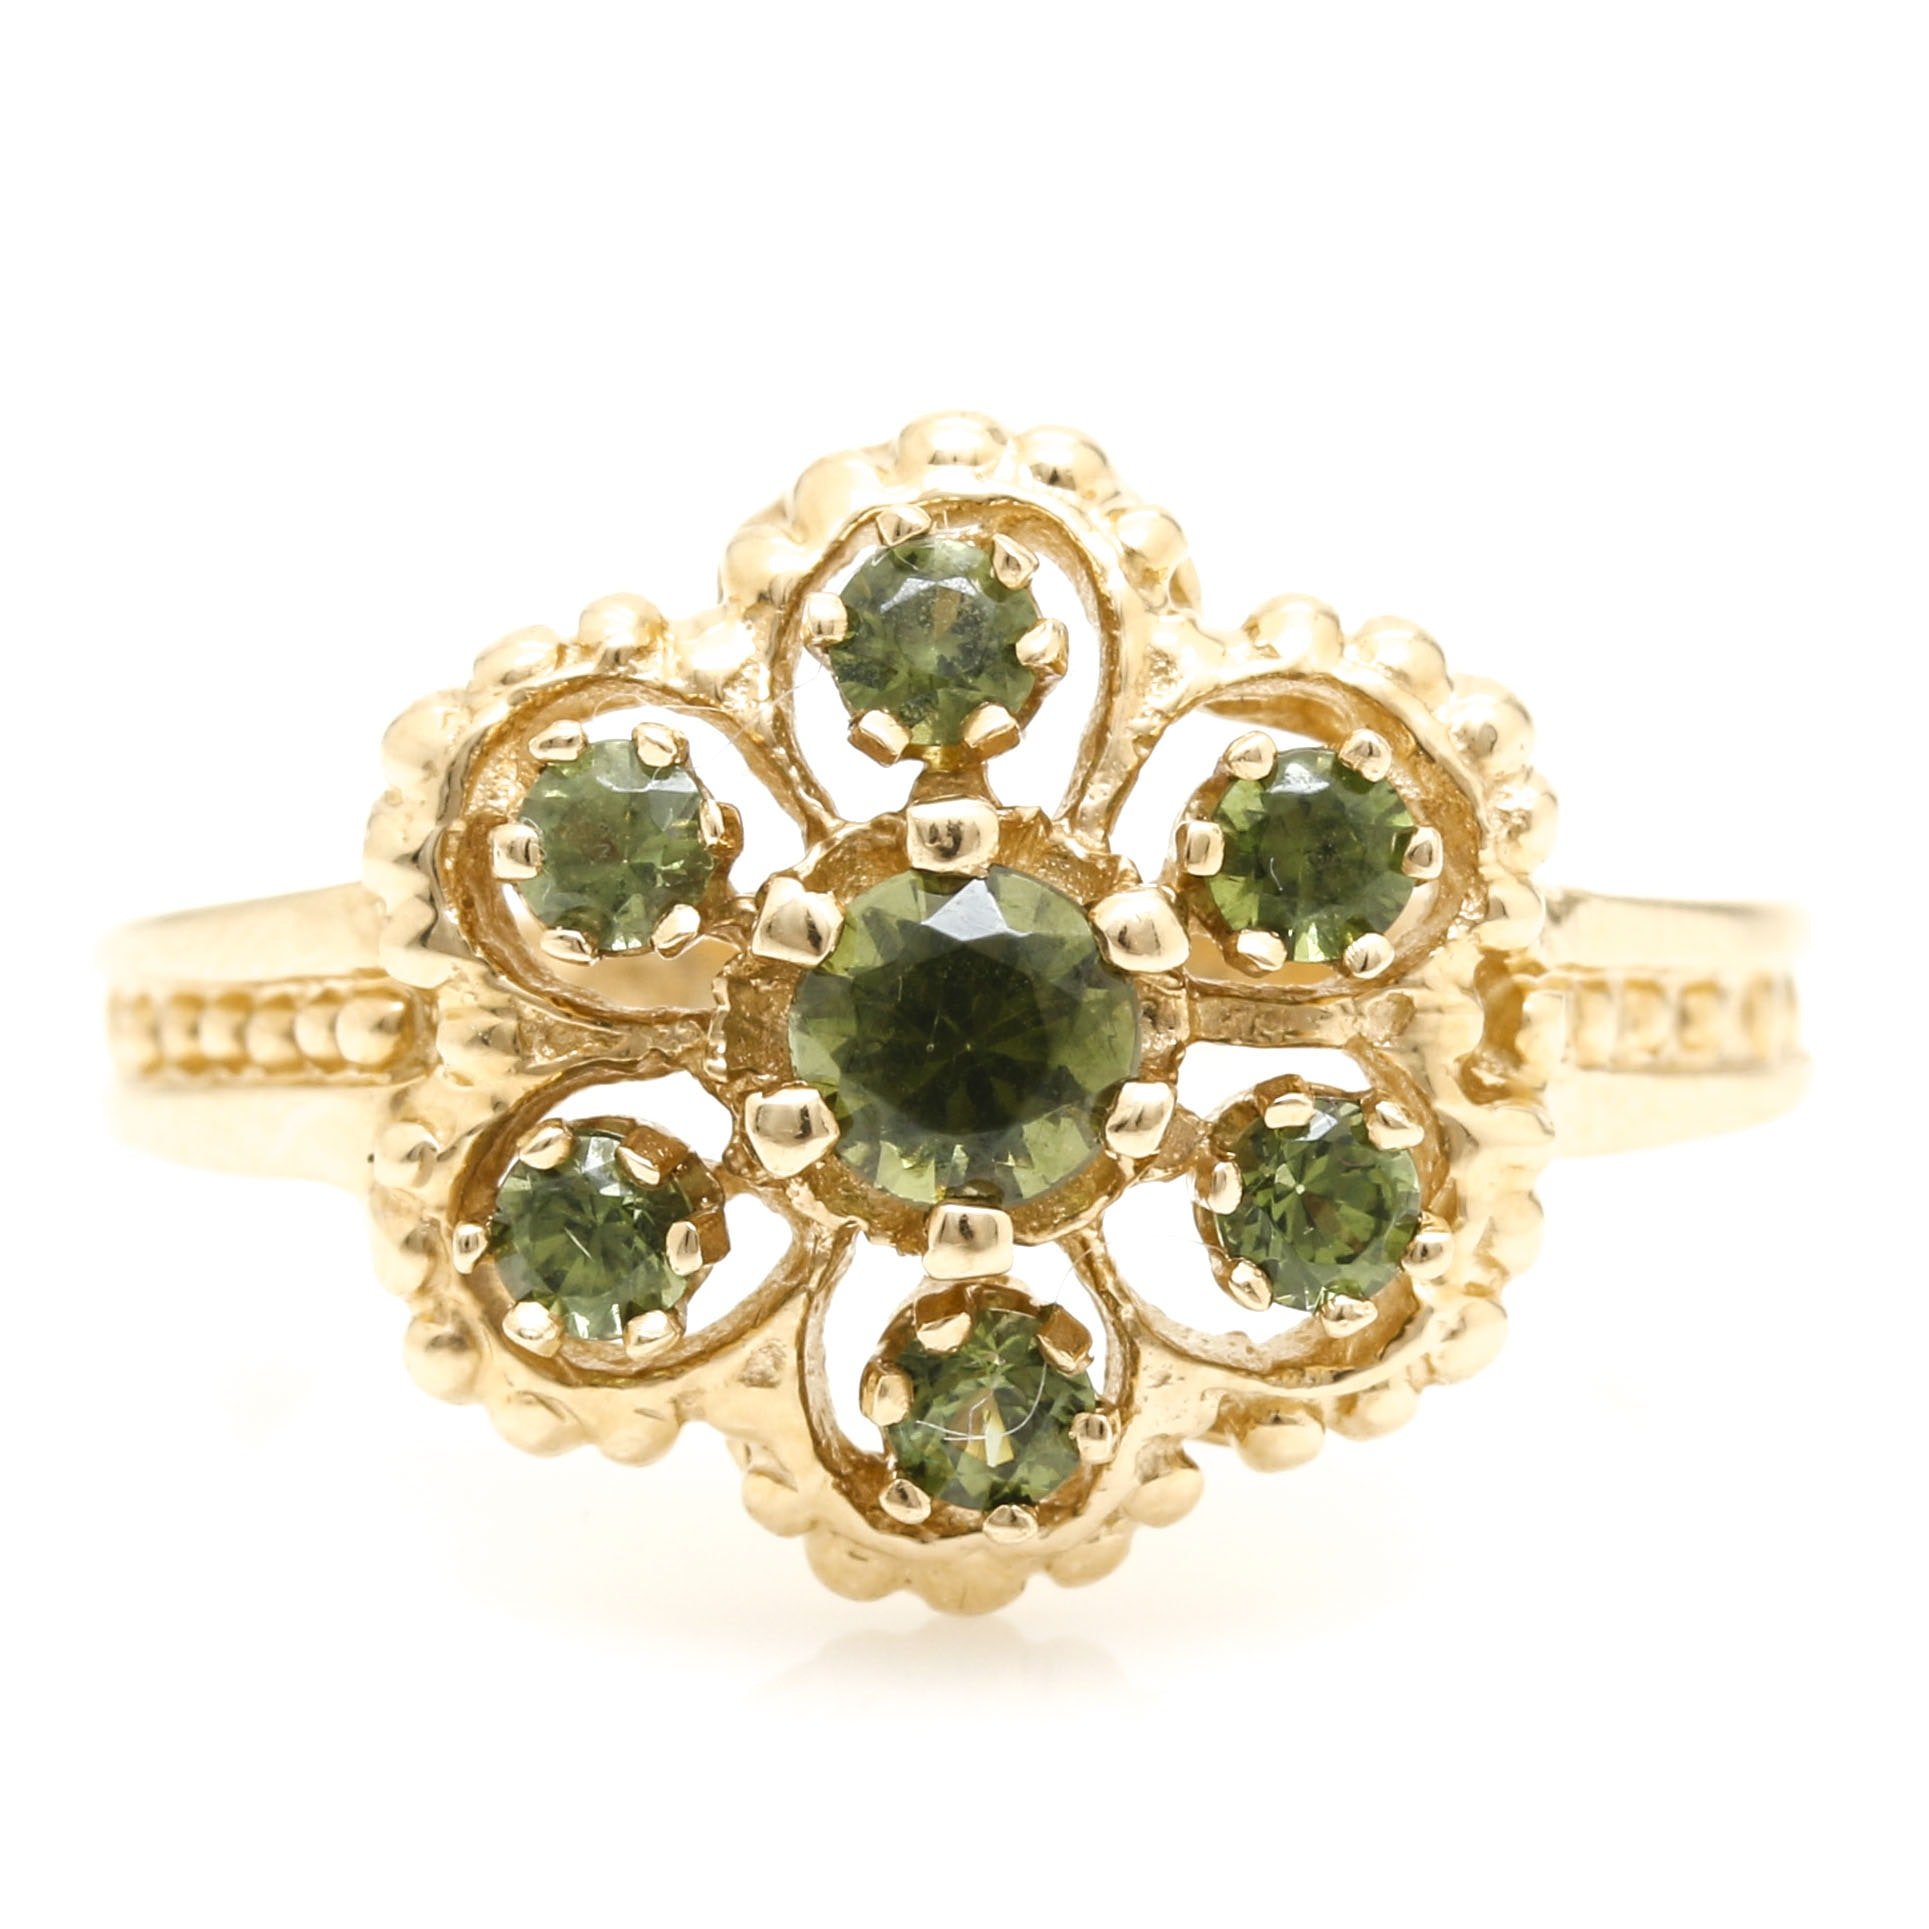 14K Yellow Gold Idocrase Ring